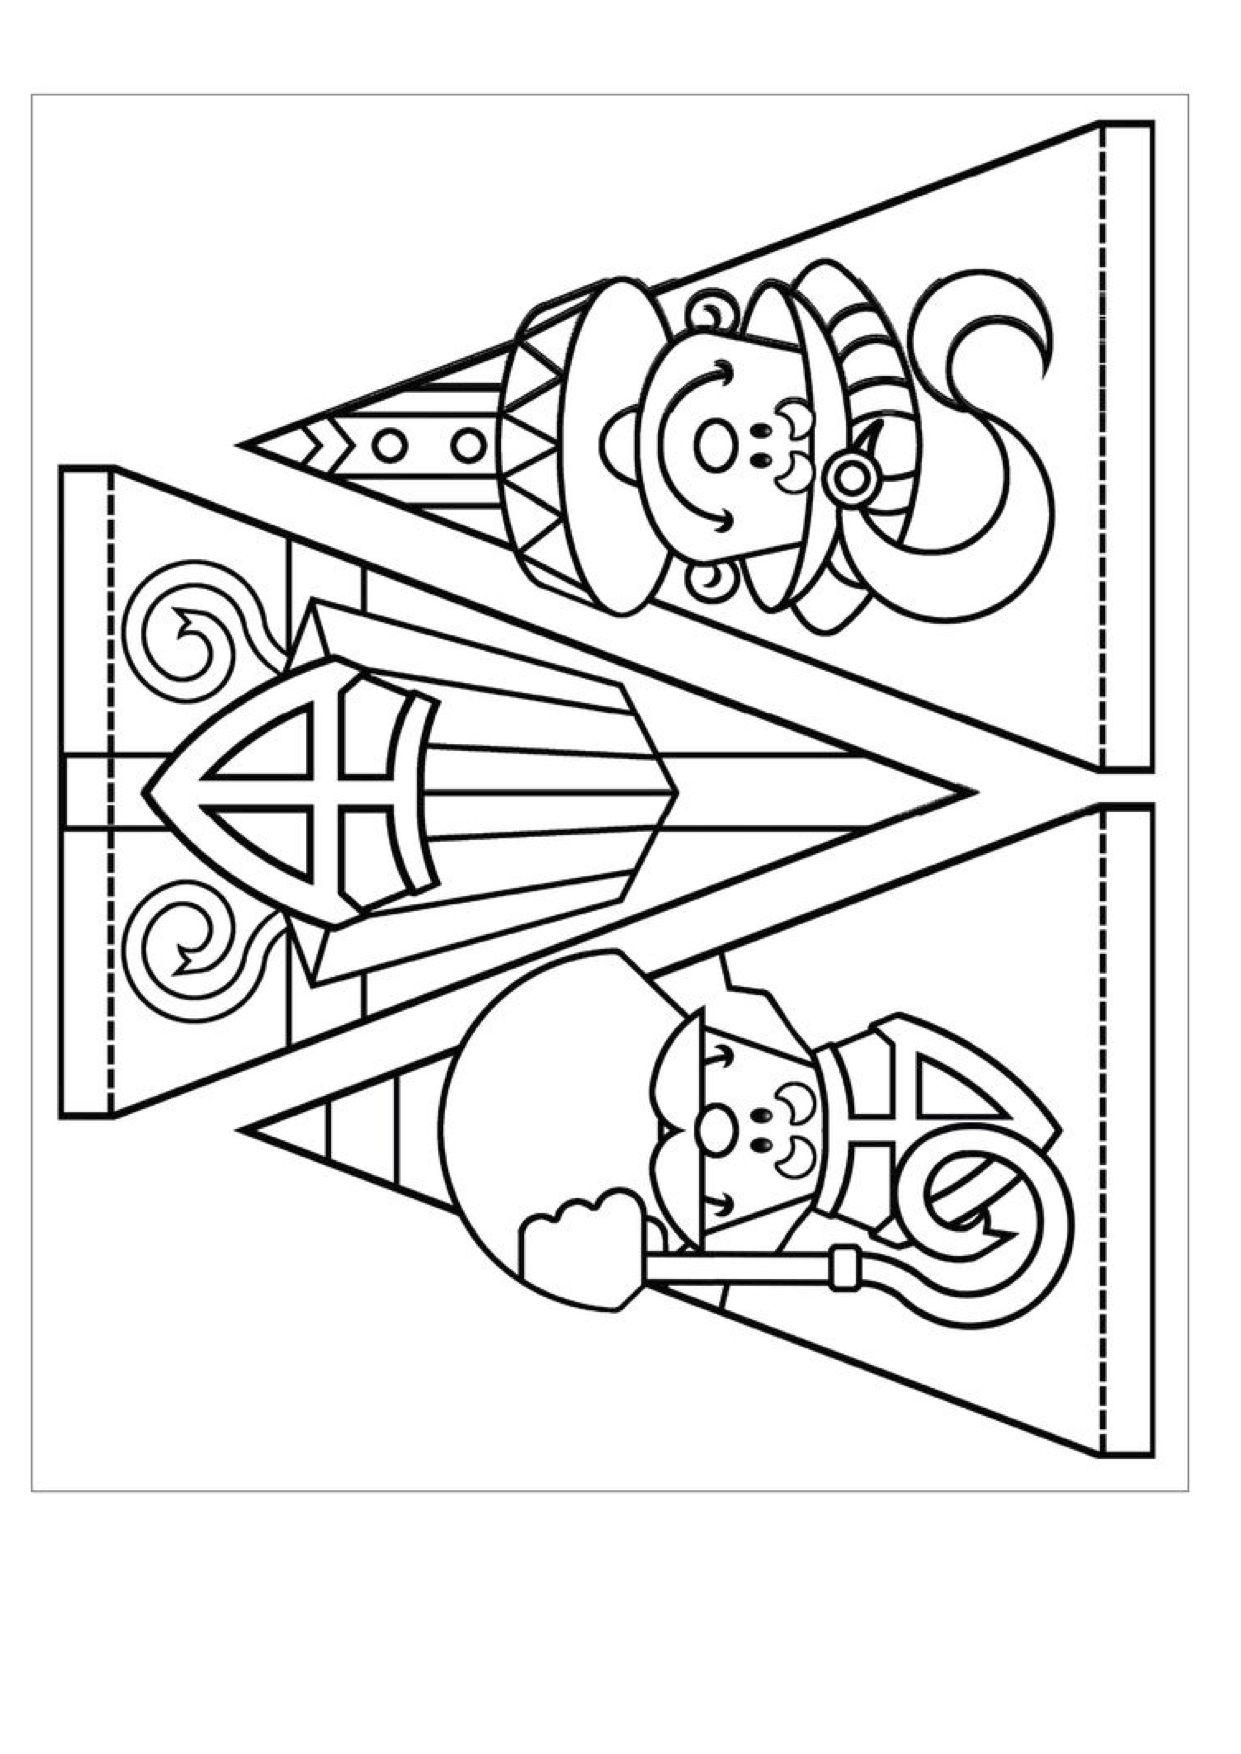 Vlaggetjes Vlaggenlijn Sinterklaas Sinterklaas Knutselen Sinterklaas